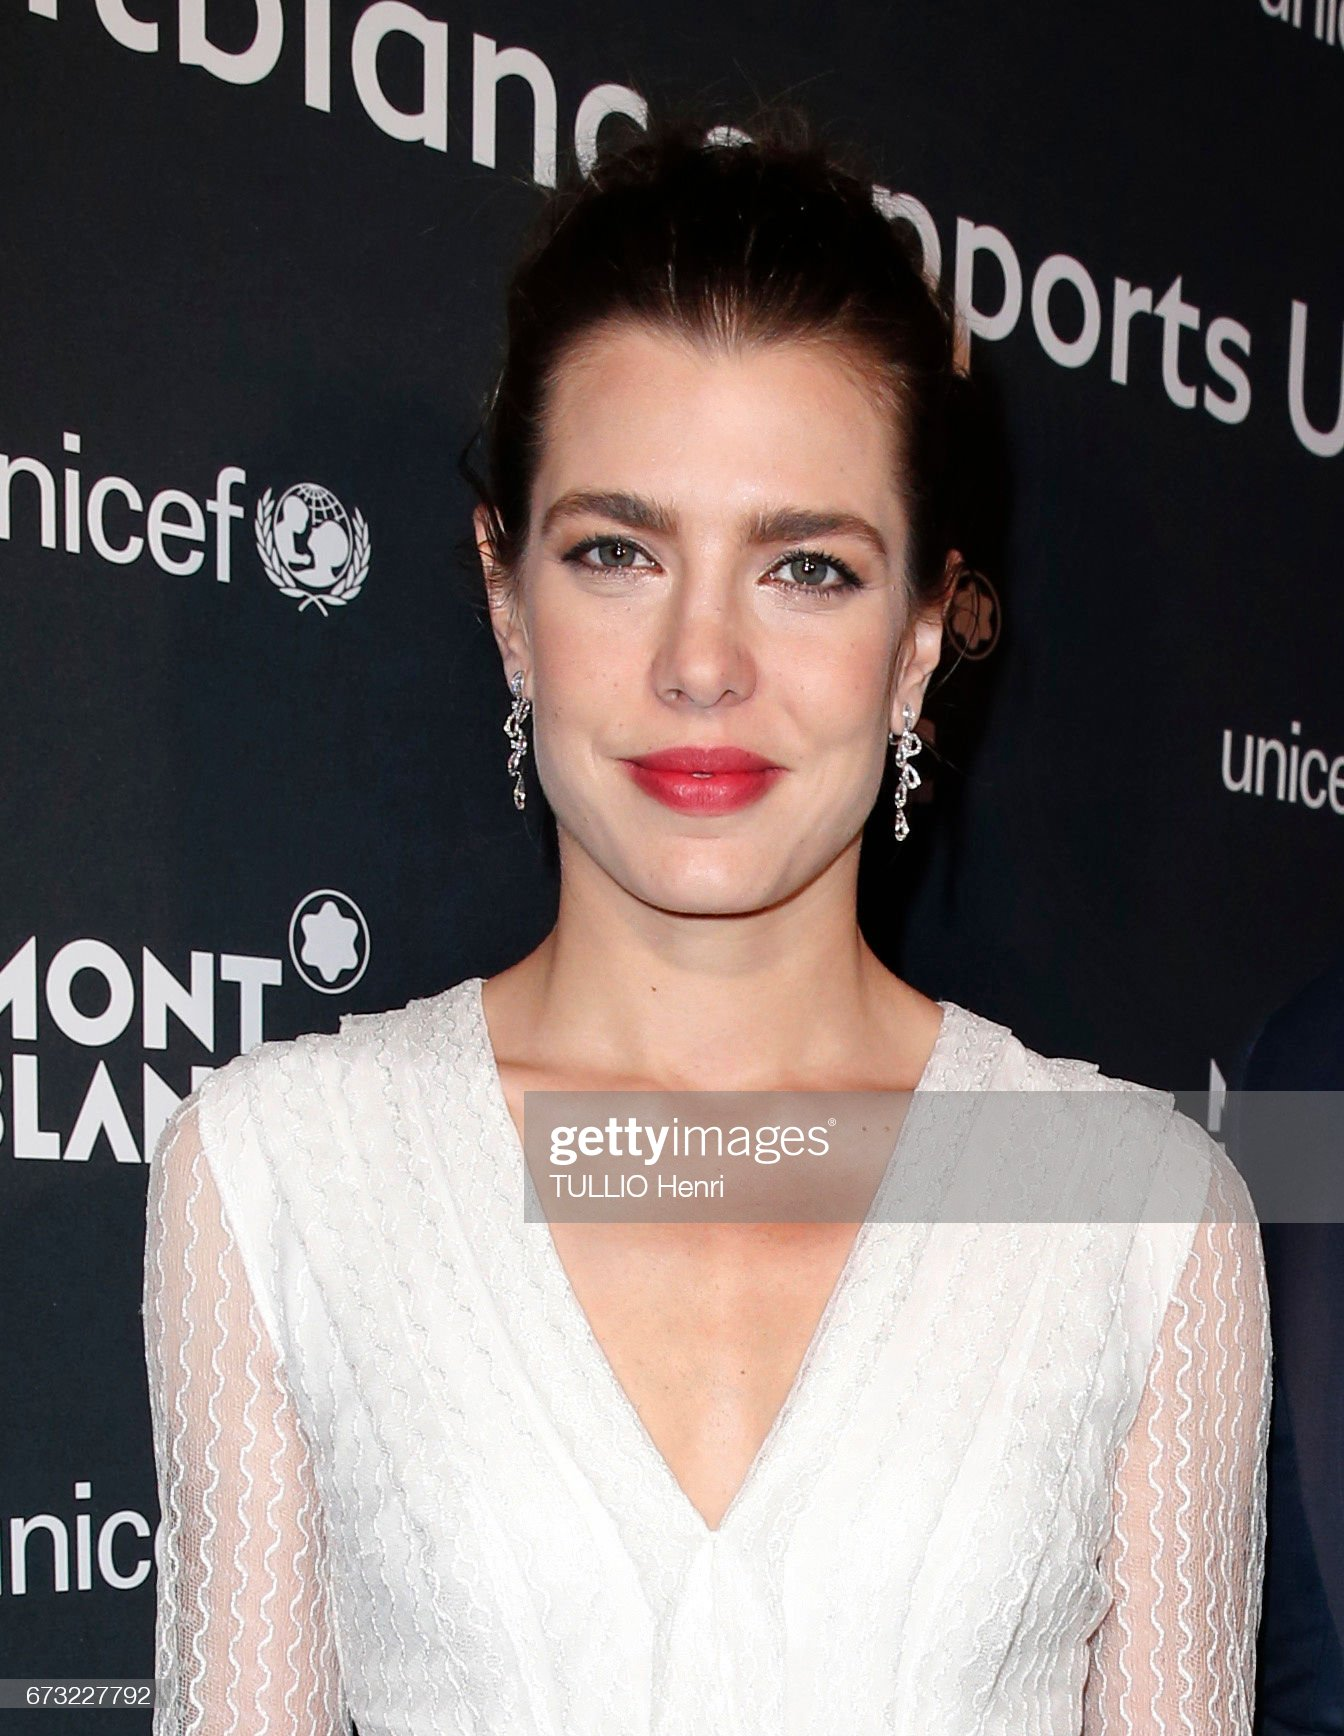 MontBlanc for Unicef Evening Gala : News Photo